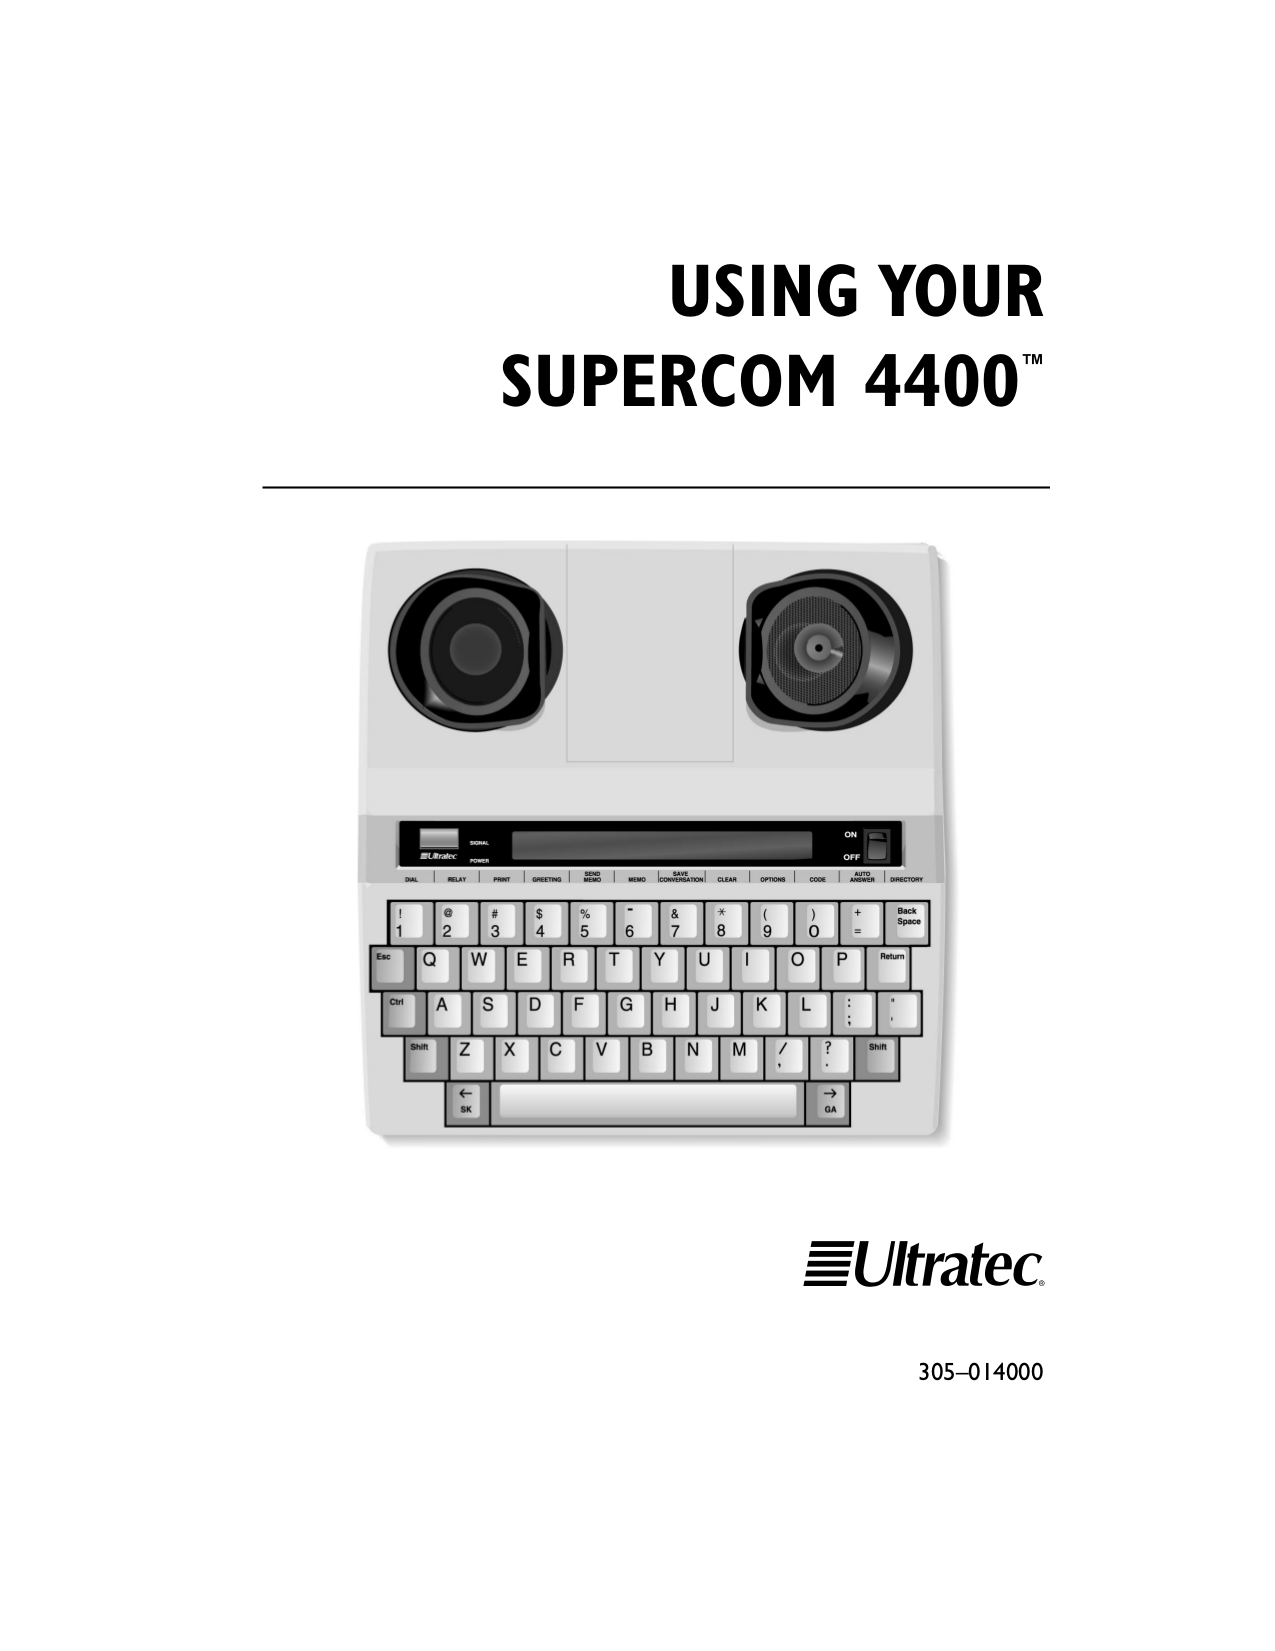 pdf for Ultratec Telephone Supercom 4400 manual